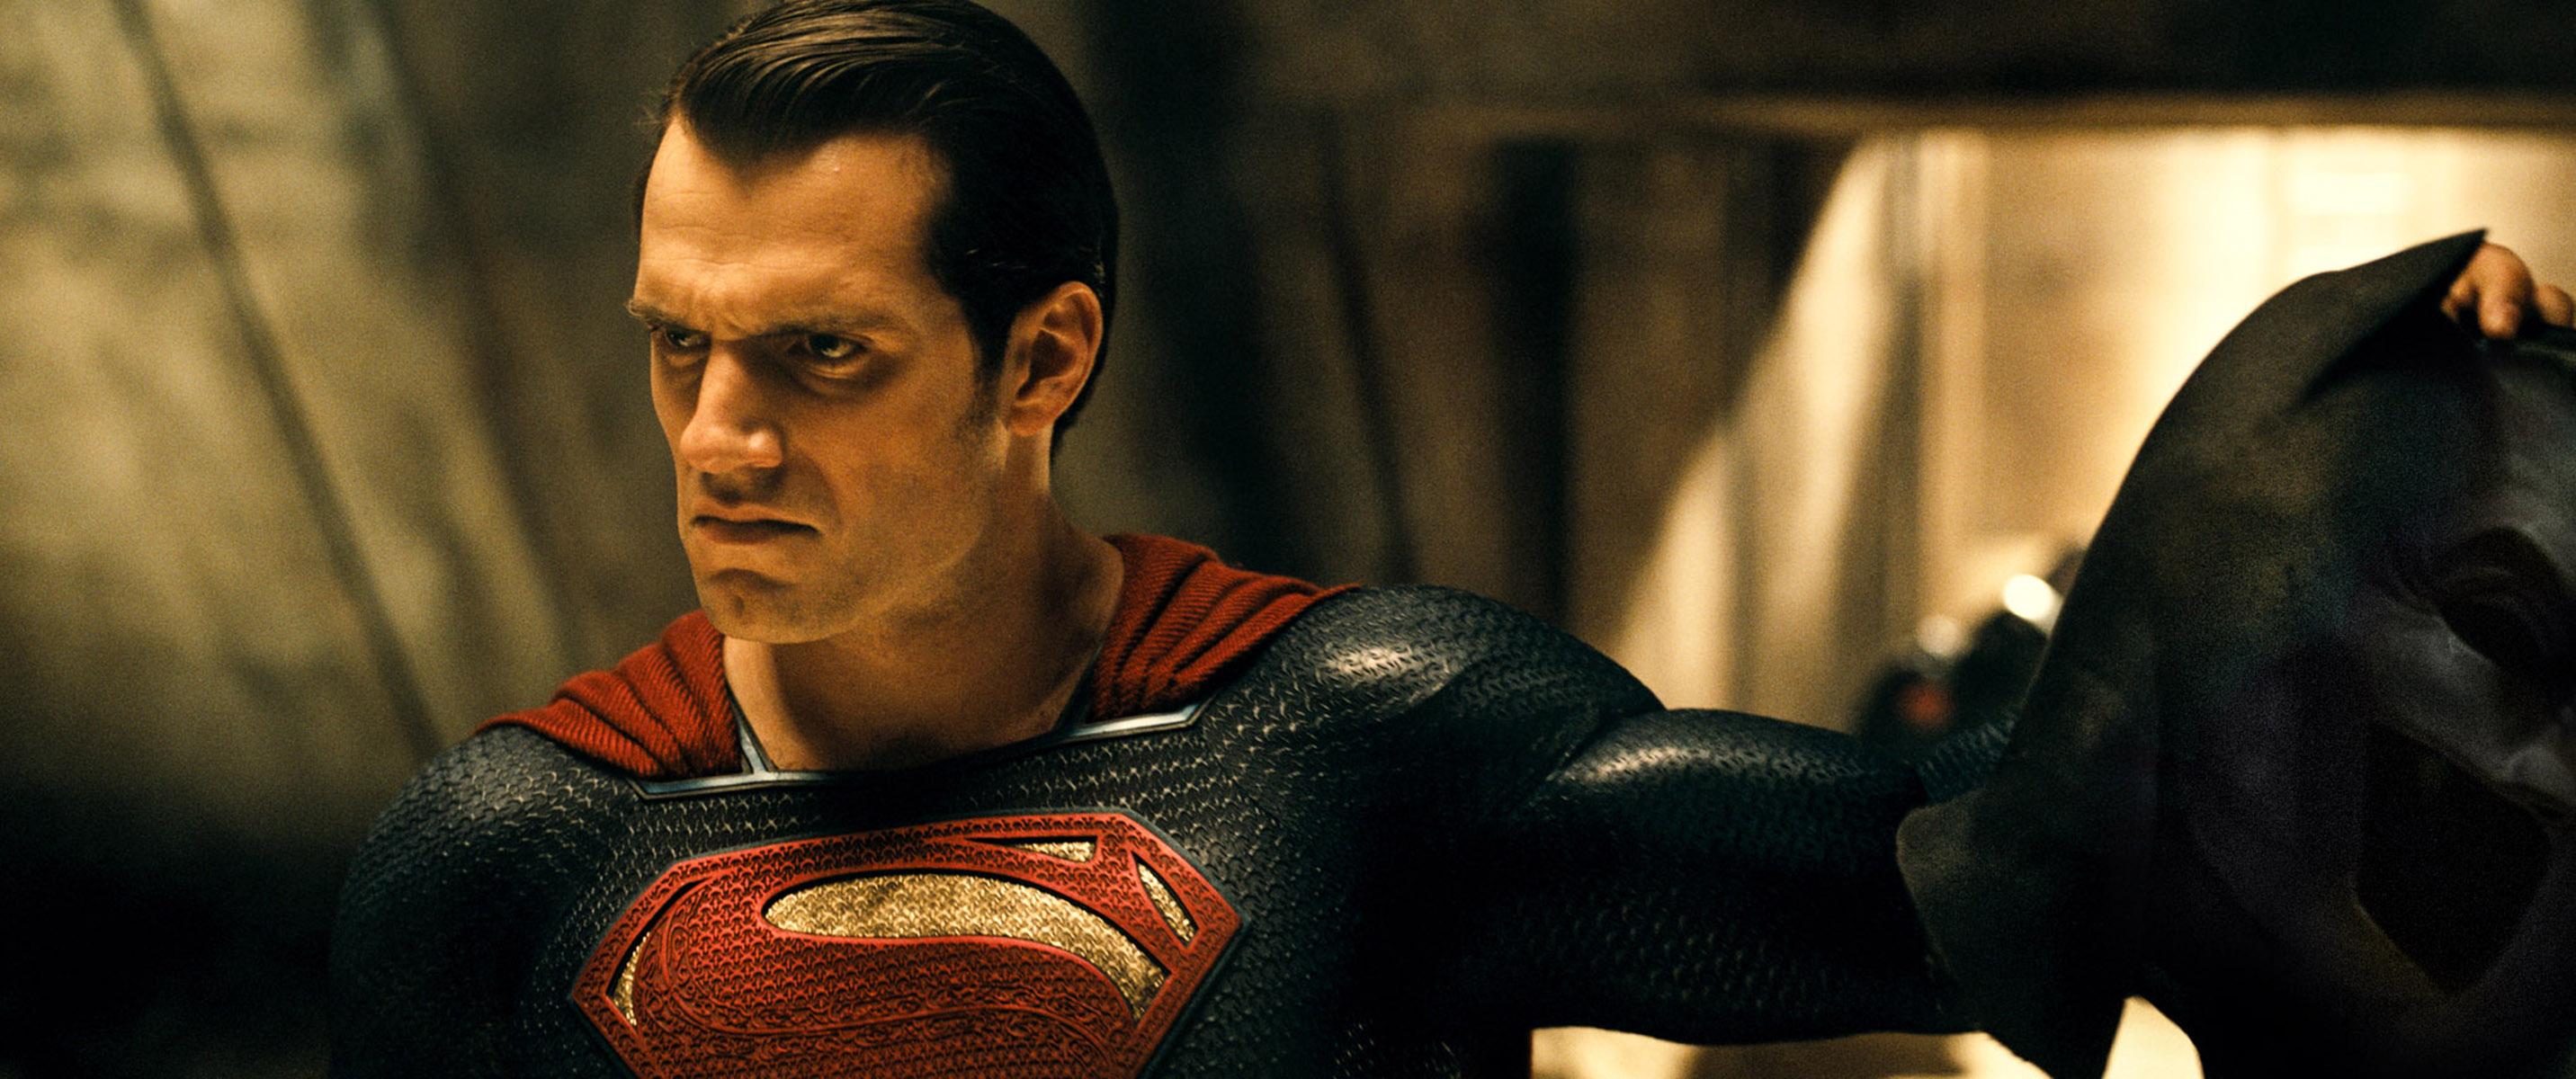 We Explain the Batman v Superman Dream Sequence